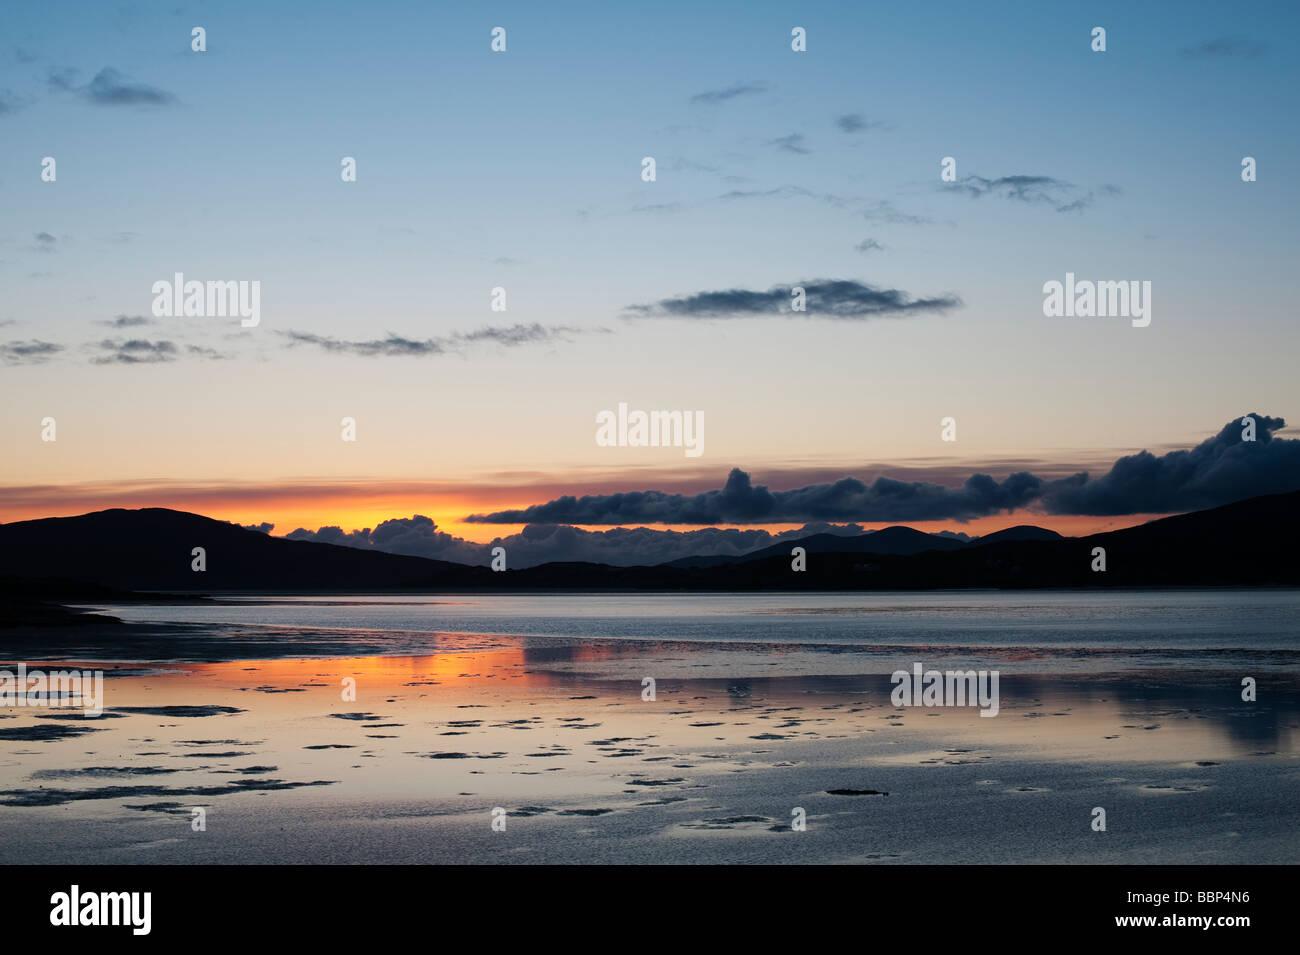 Sunset over Luskentyre estuary and Taransay, Isle of Harris, Outer Hebrides, Scotland, - Stock Image